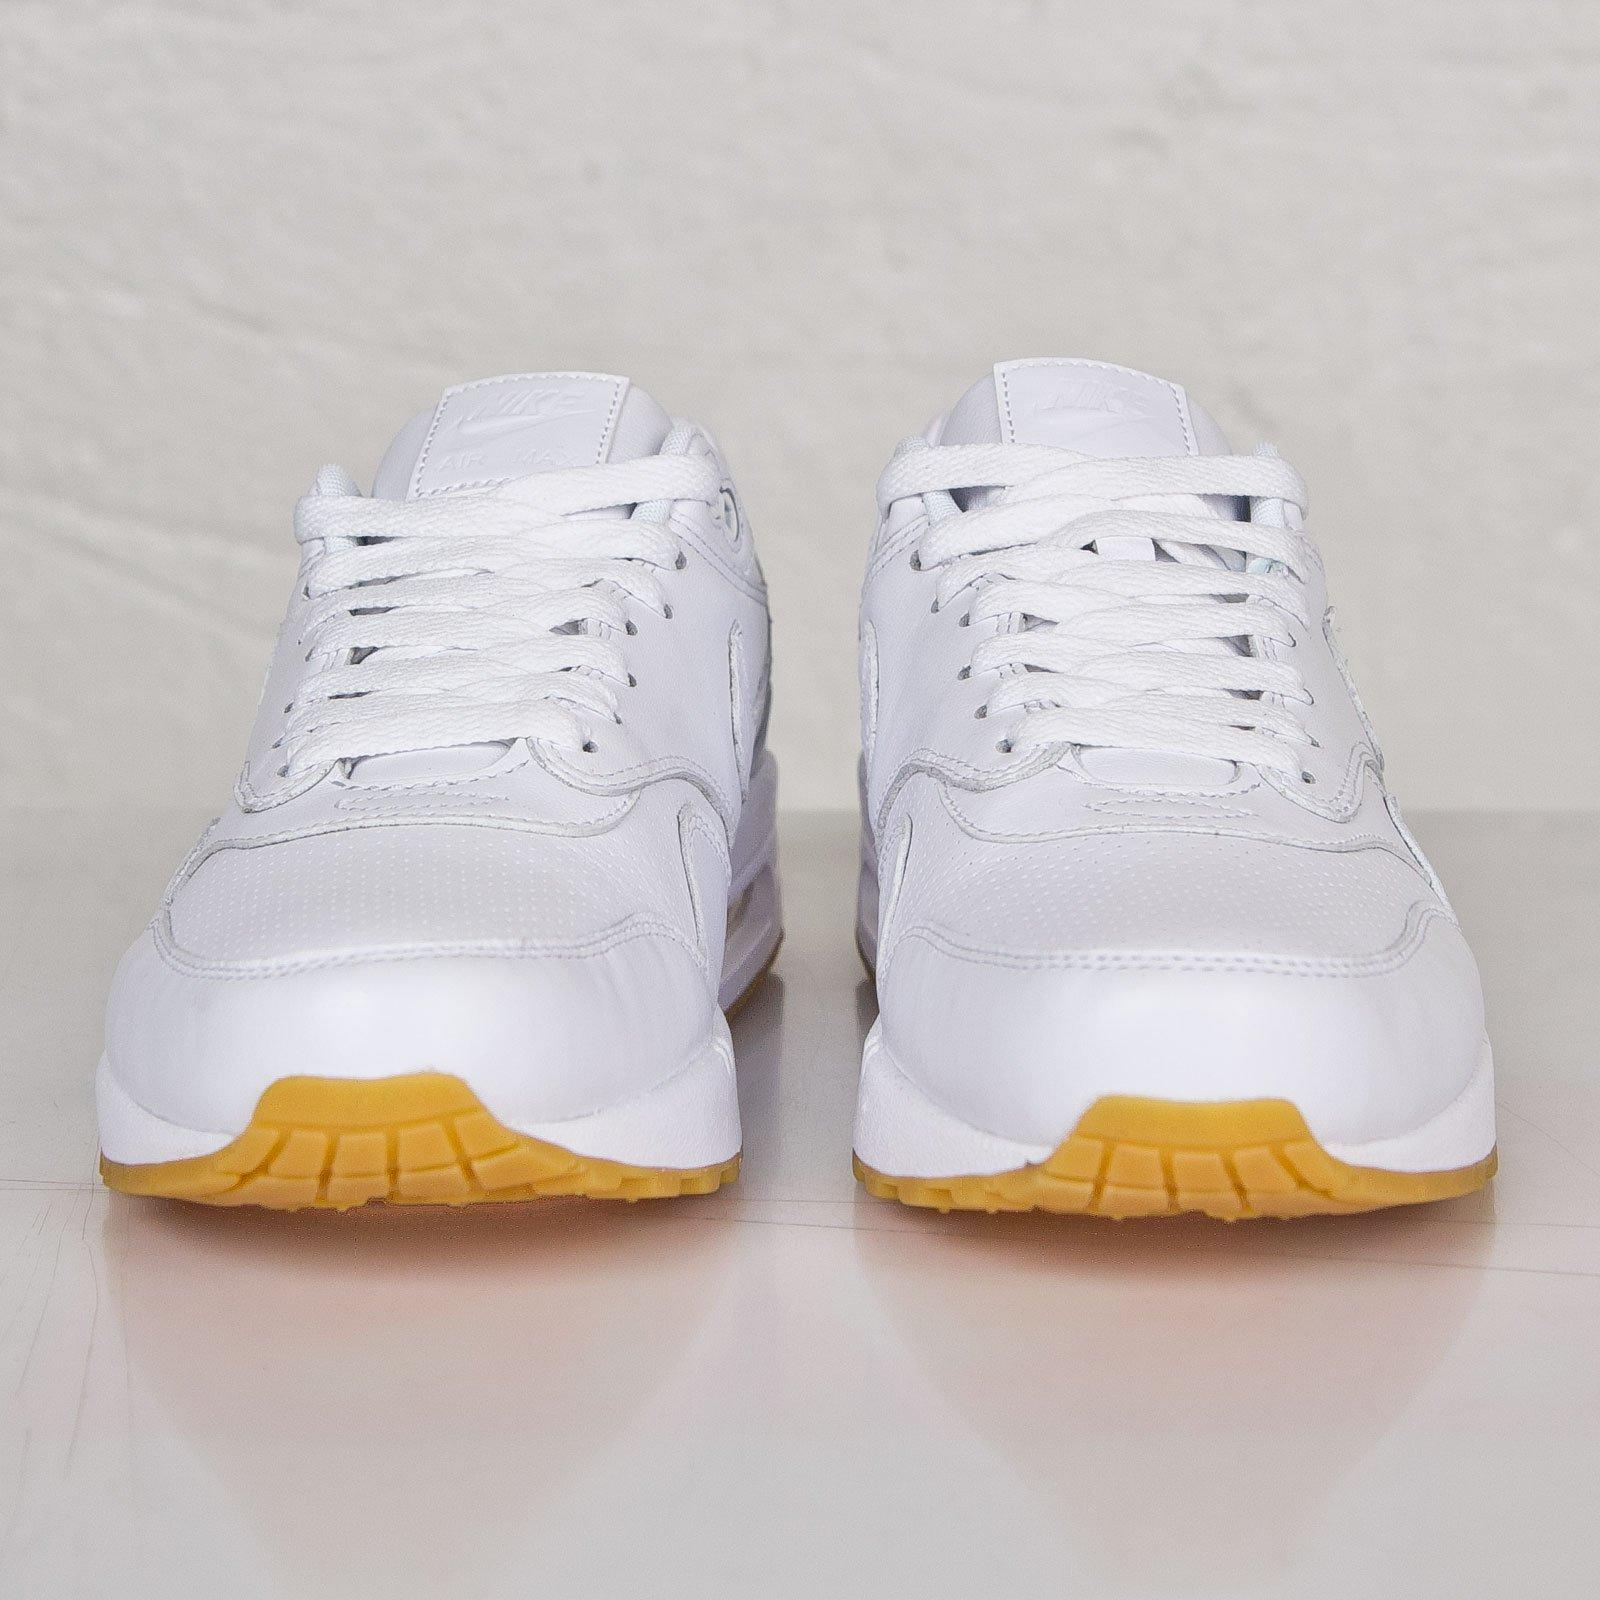 Mens Nike Air Max 1 Leather PA 705007 111 White Gum